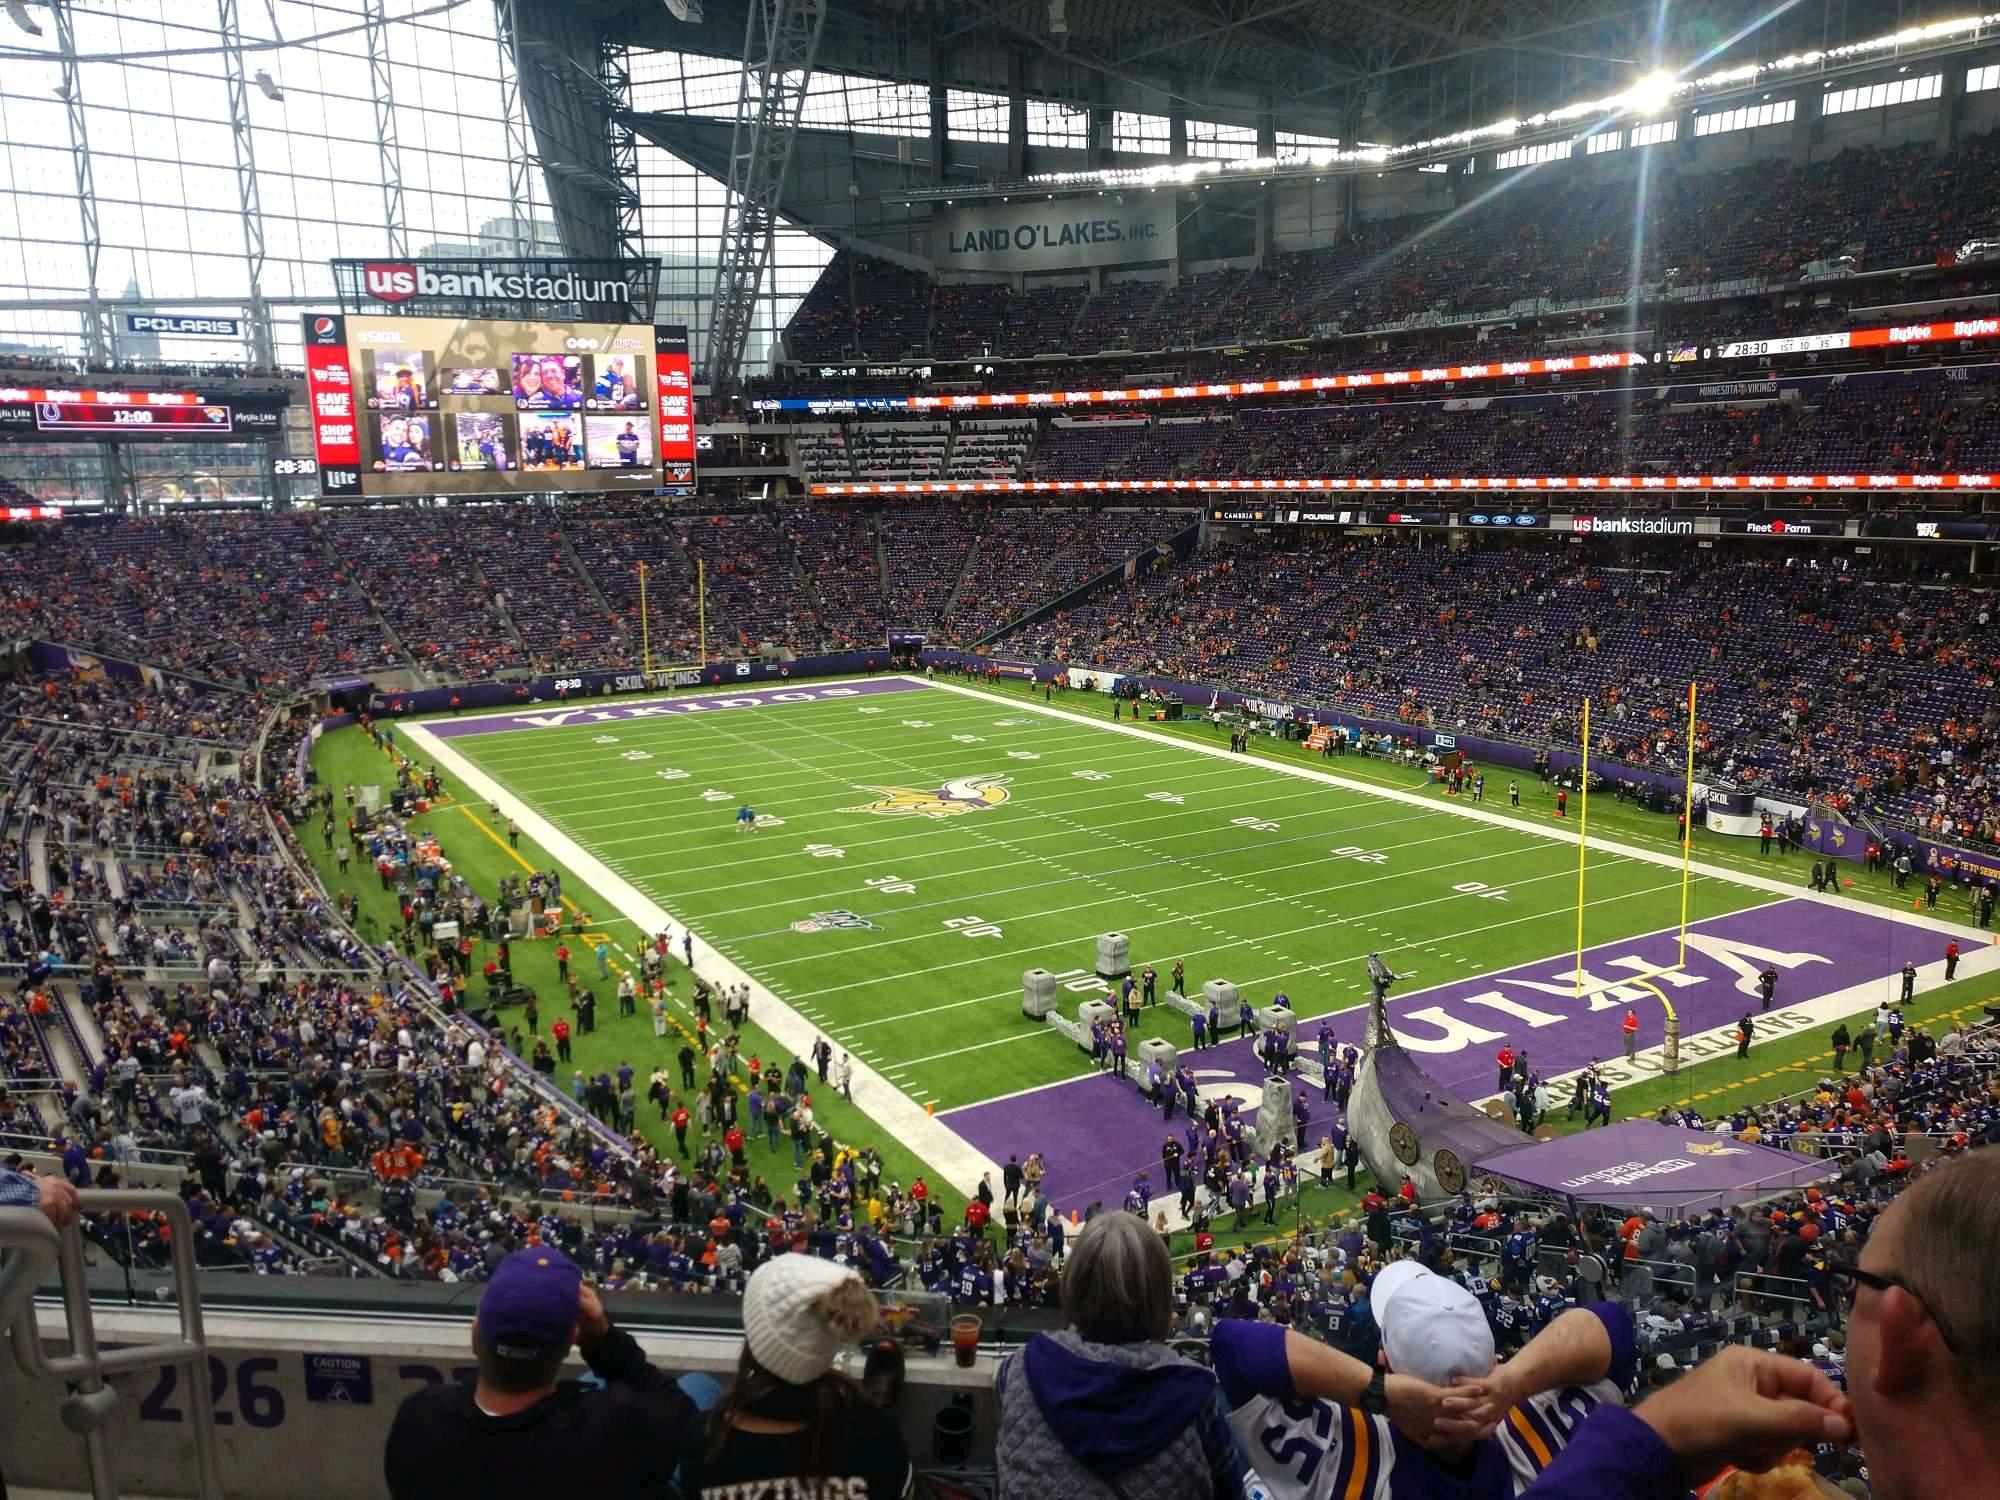 U.S. Bank Stadium Section 225 Row 4 Seat 6